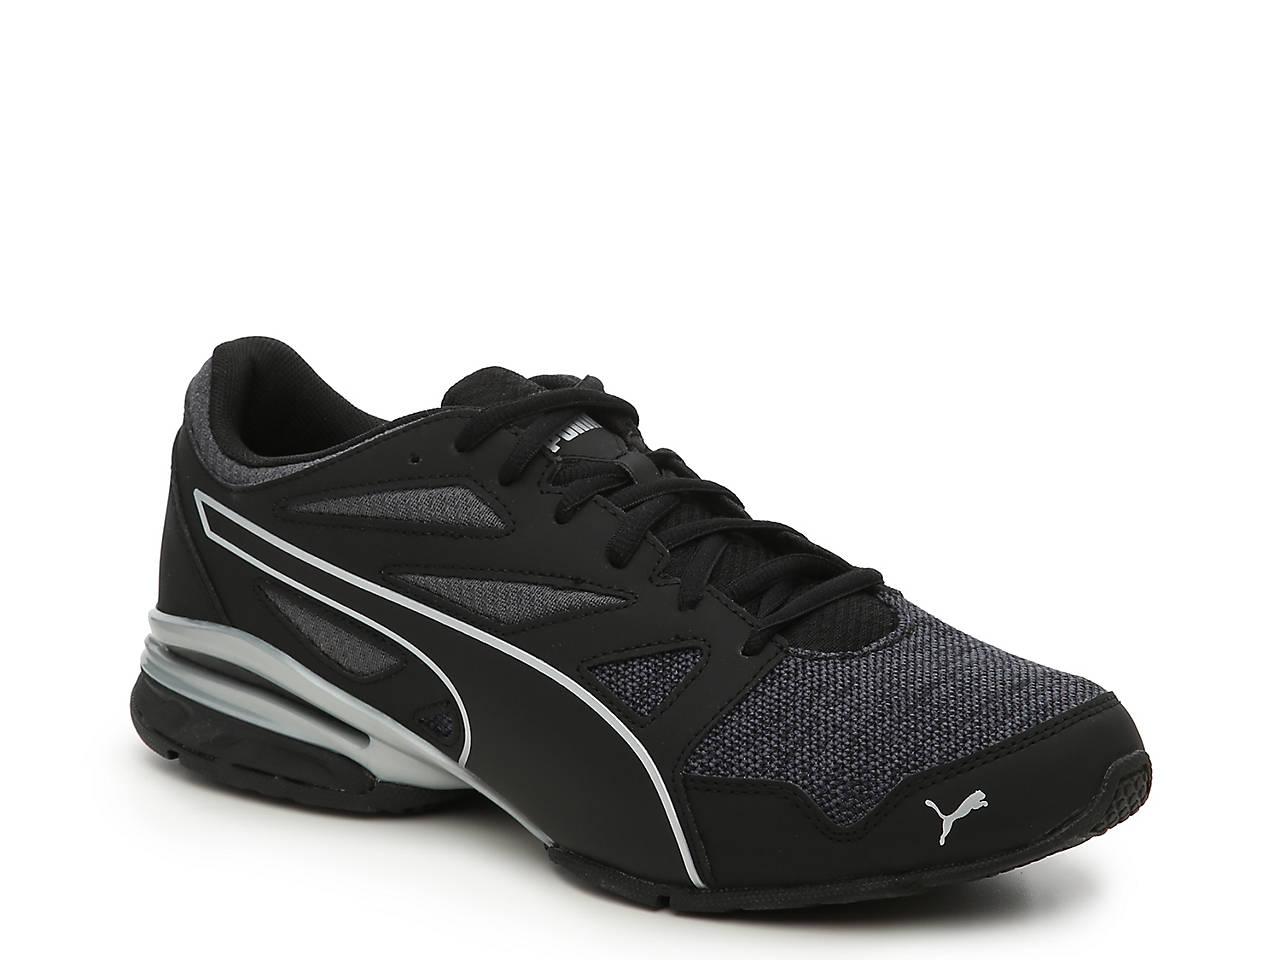 Tazon Modern Sneaker Men's